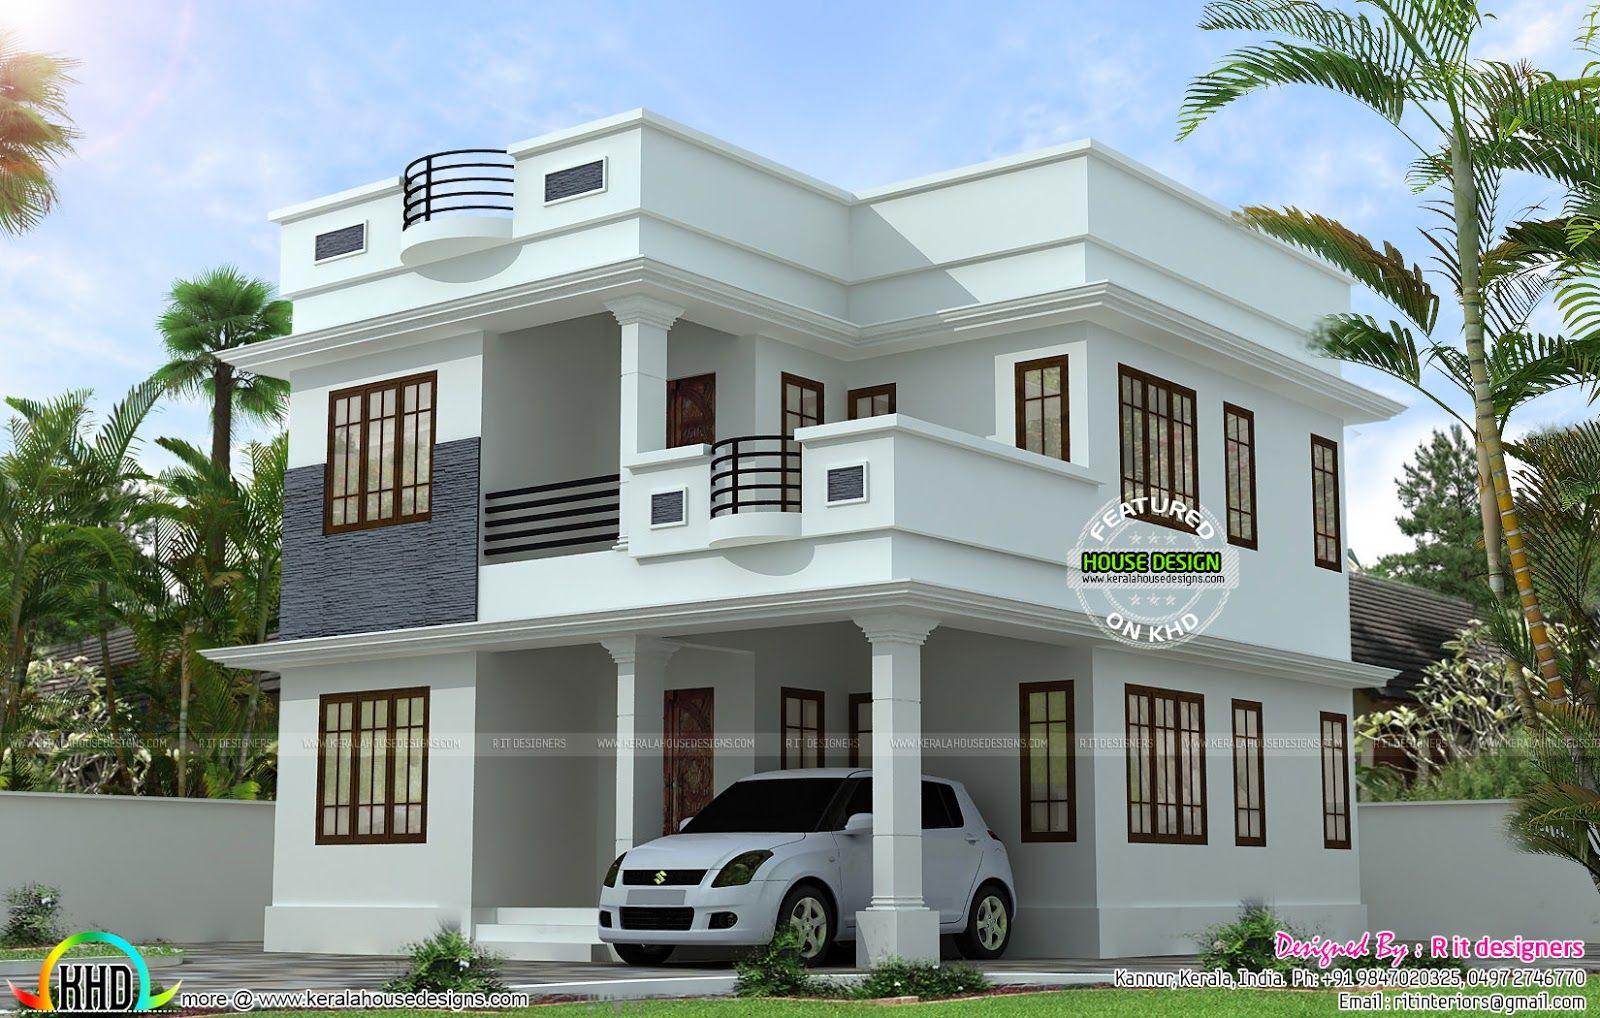 home design  decor in 2019  Interior Design For House  House plans Kerala house design Home